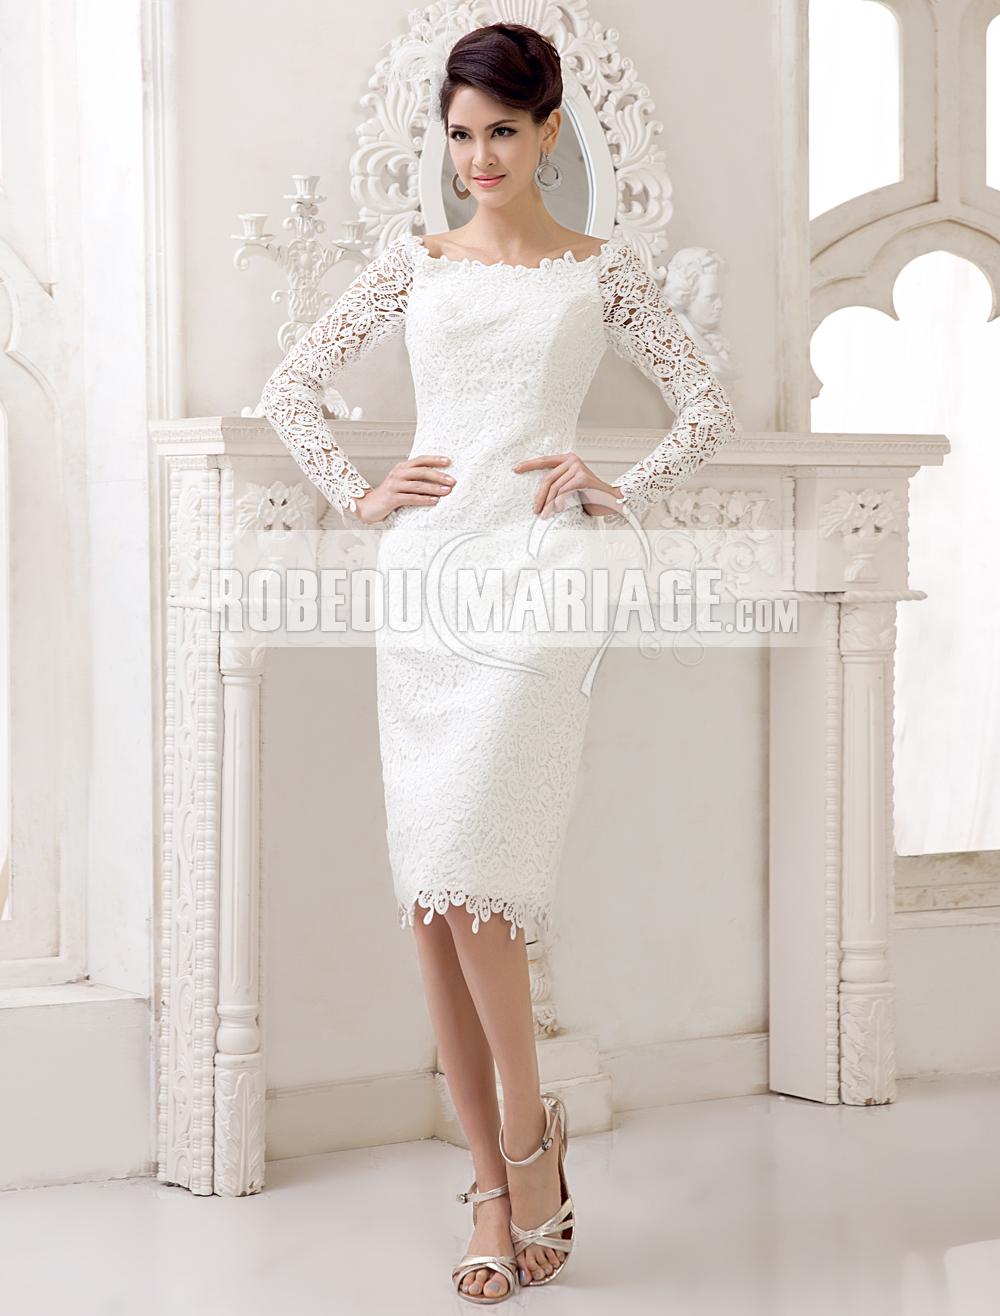 robe de mari e courte avec manches longues robe l gante robe2013629. Black Bedroom Furniture Sets. Home Design Ideas